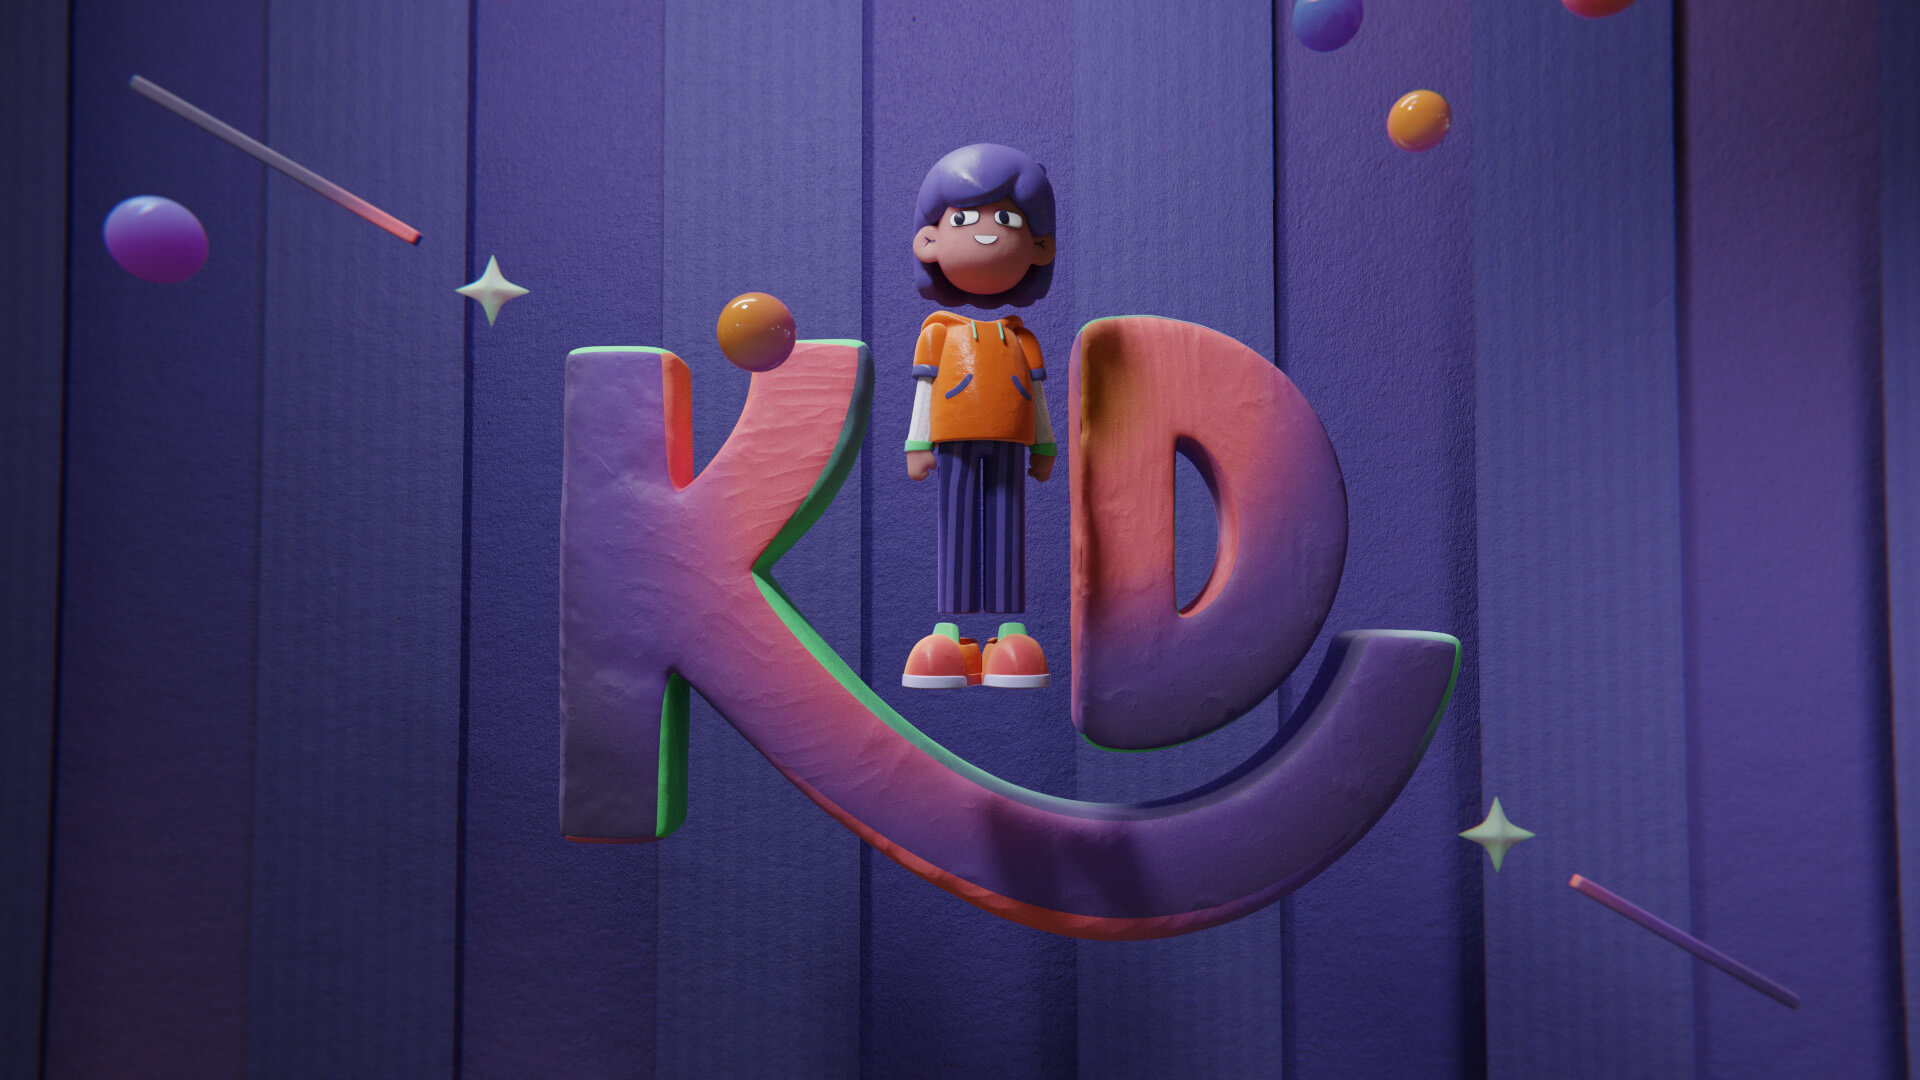 roofstudio_juni-learning_kid-02-3